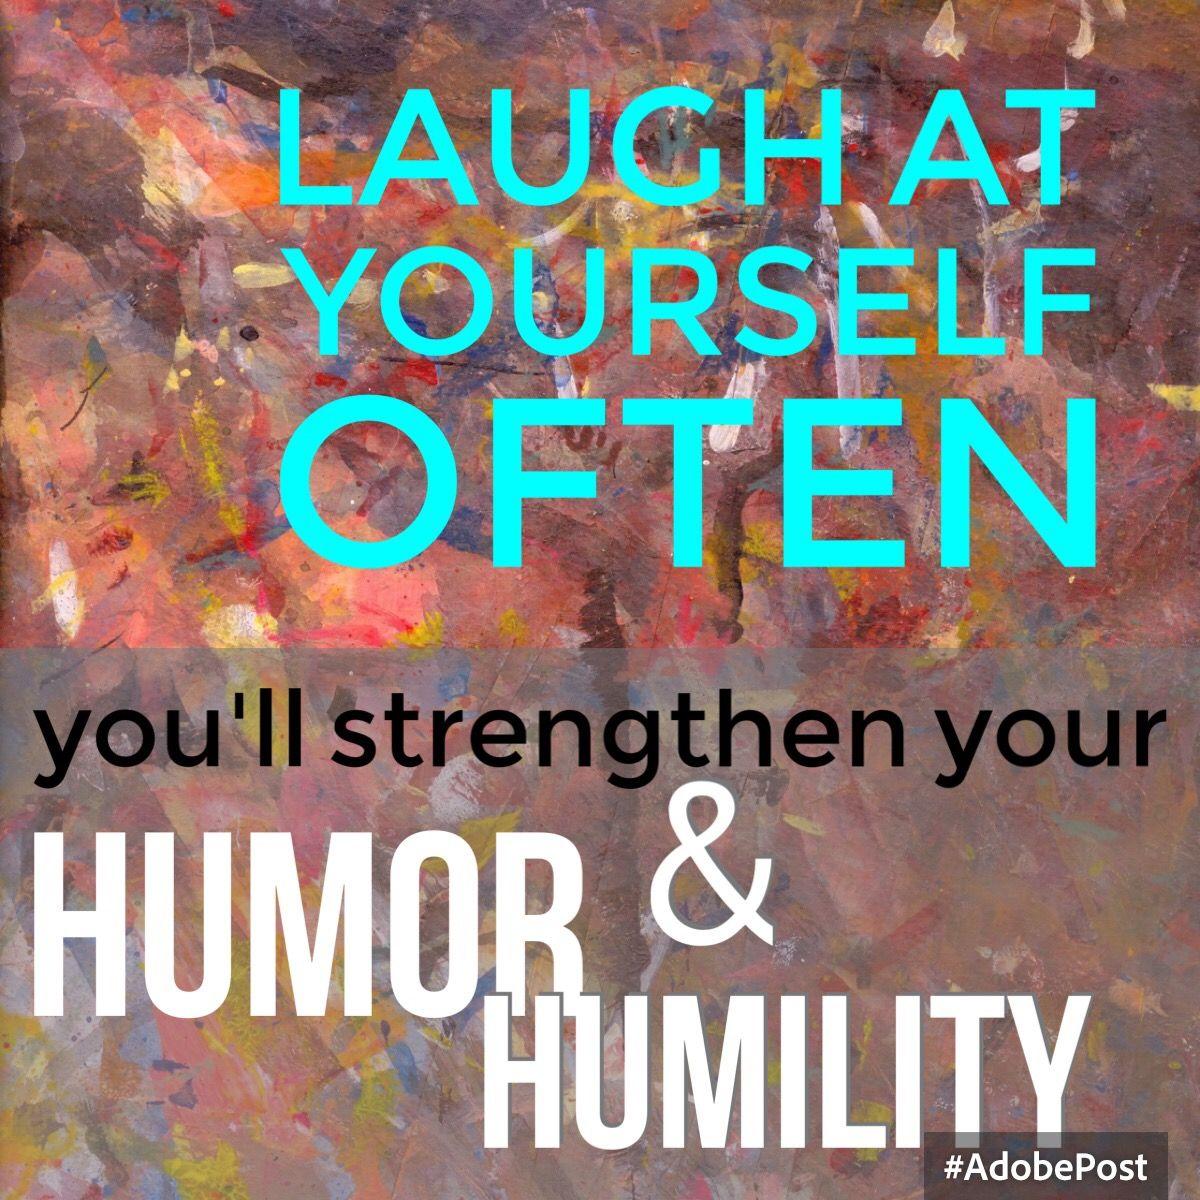 Humility dating